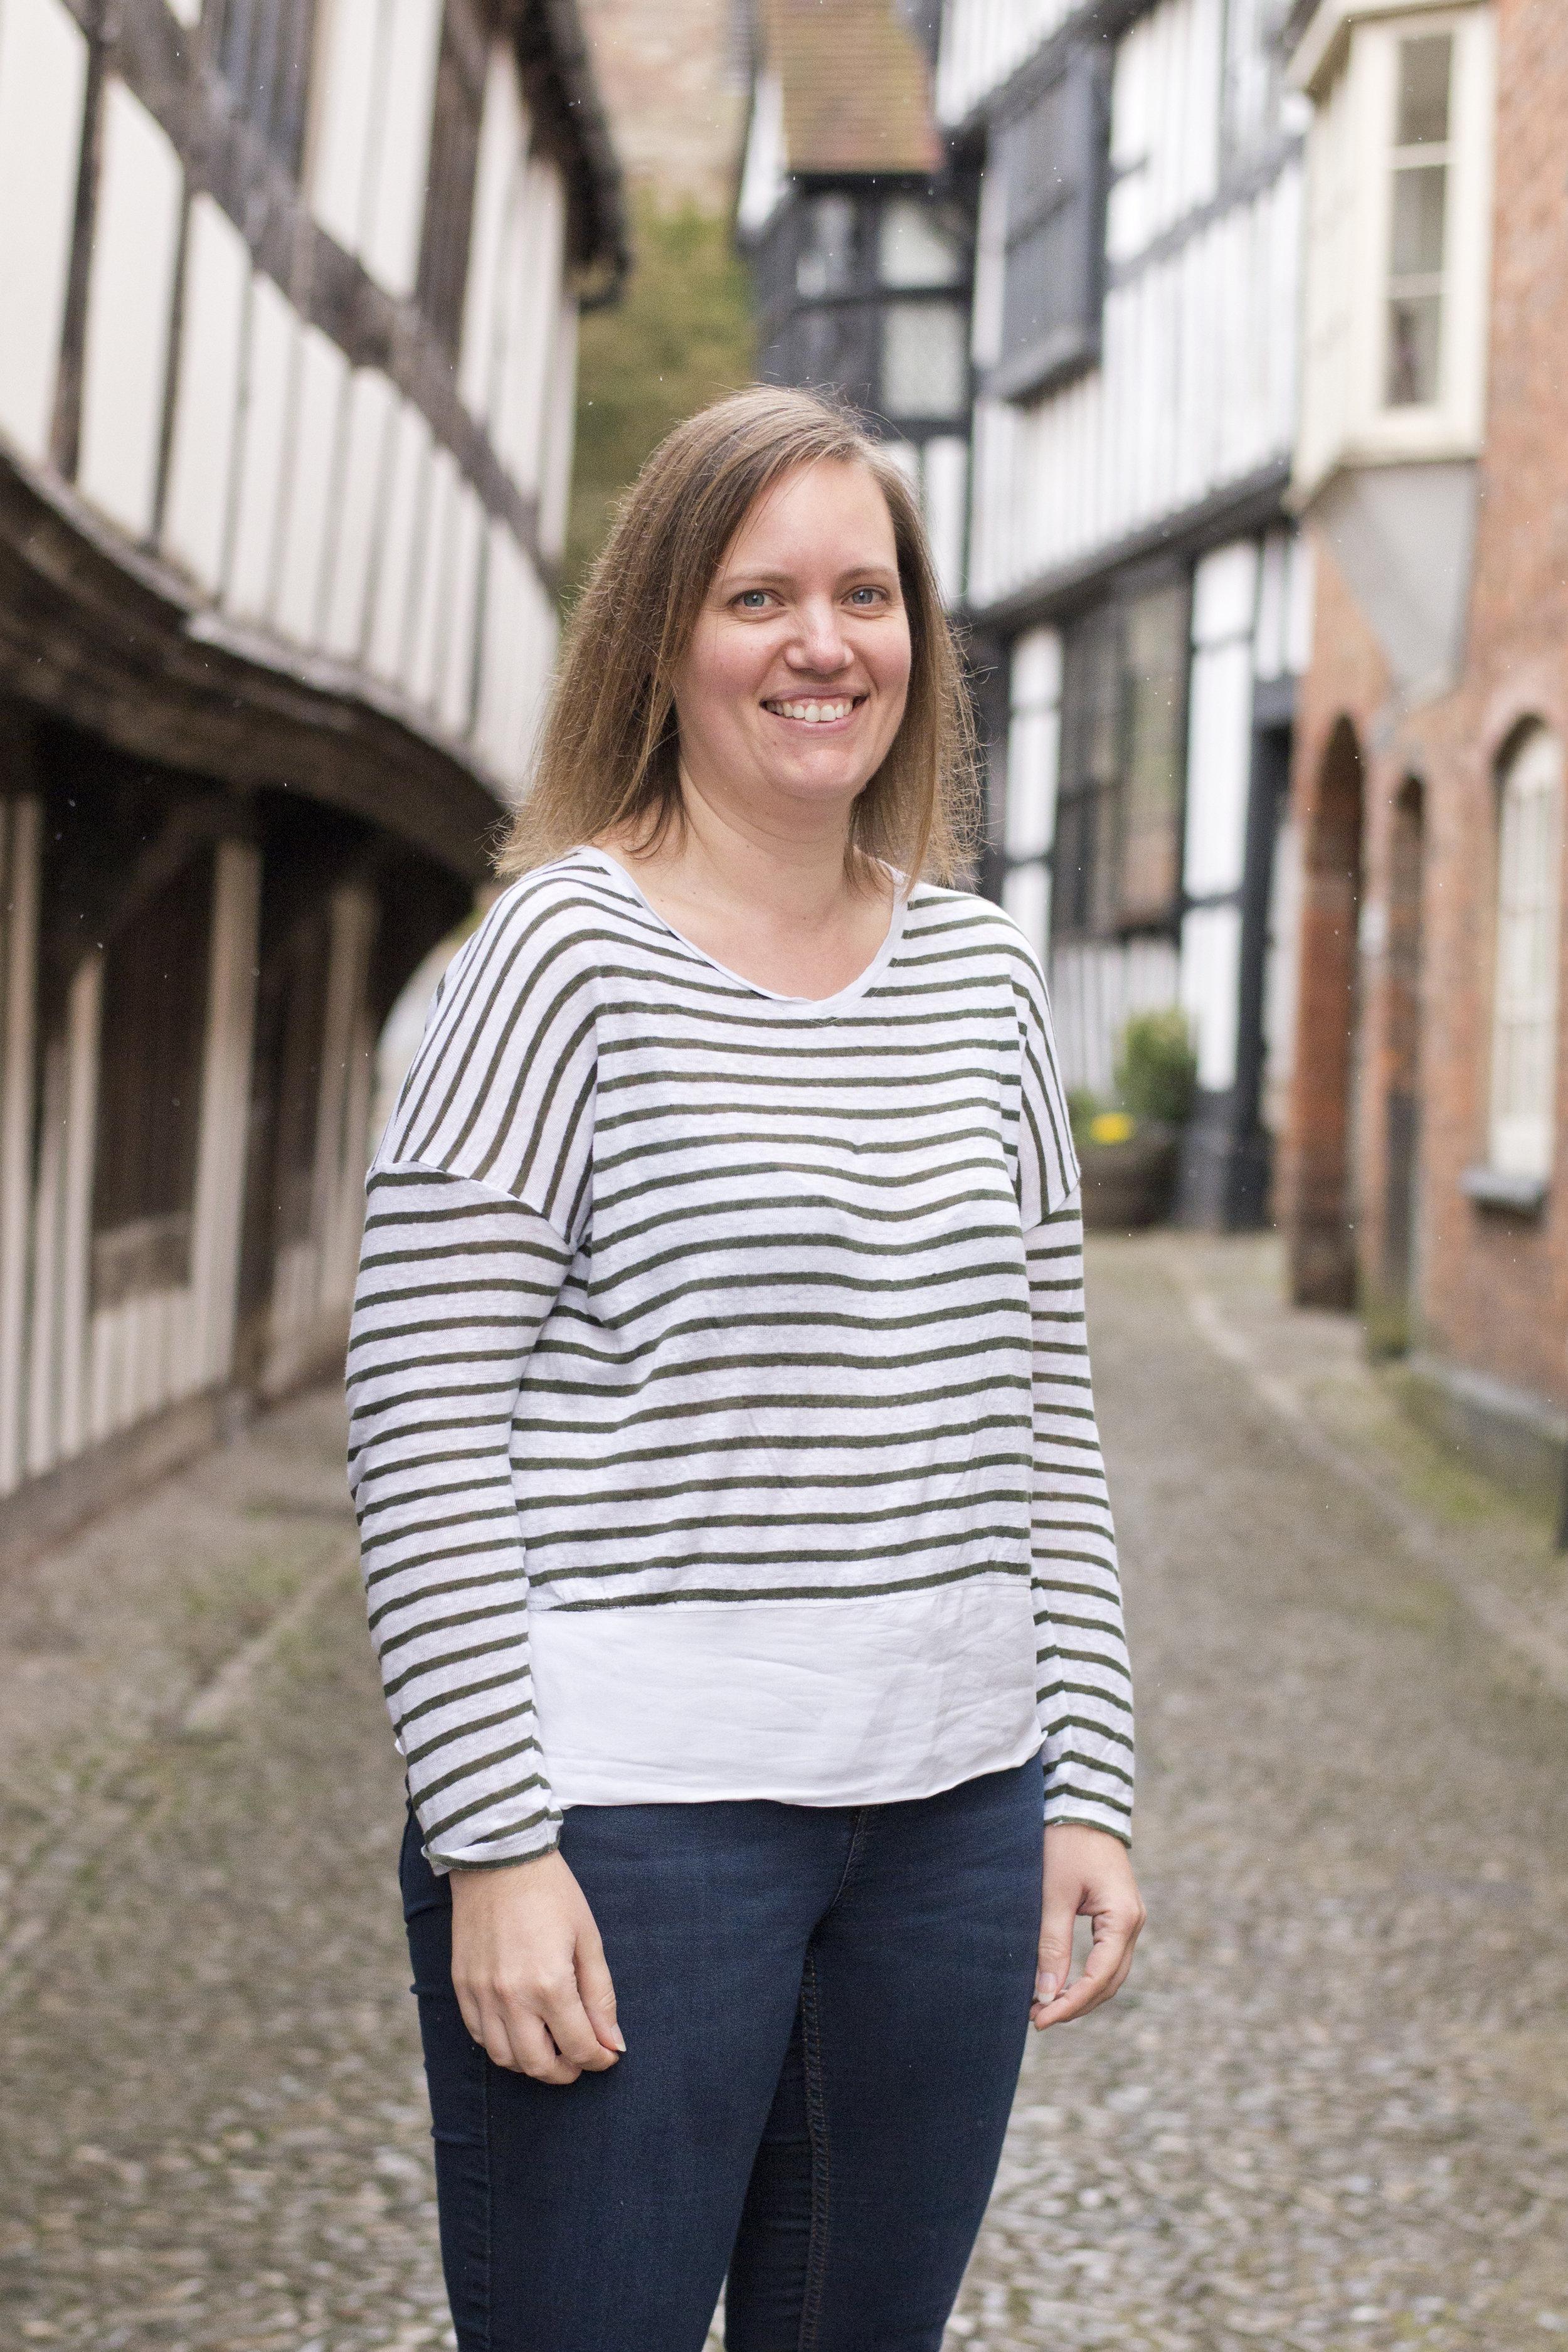 Lesley Shelley - Chartered Accountant - ShelleyHolmes Accountancy Ltd